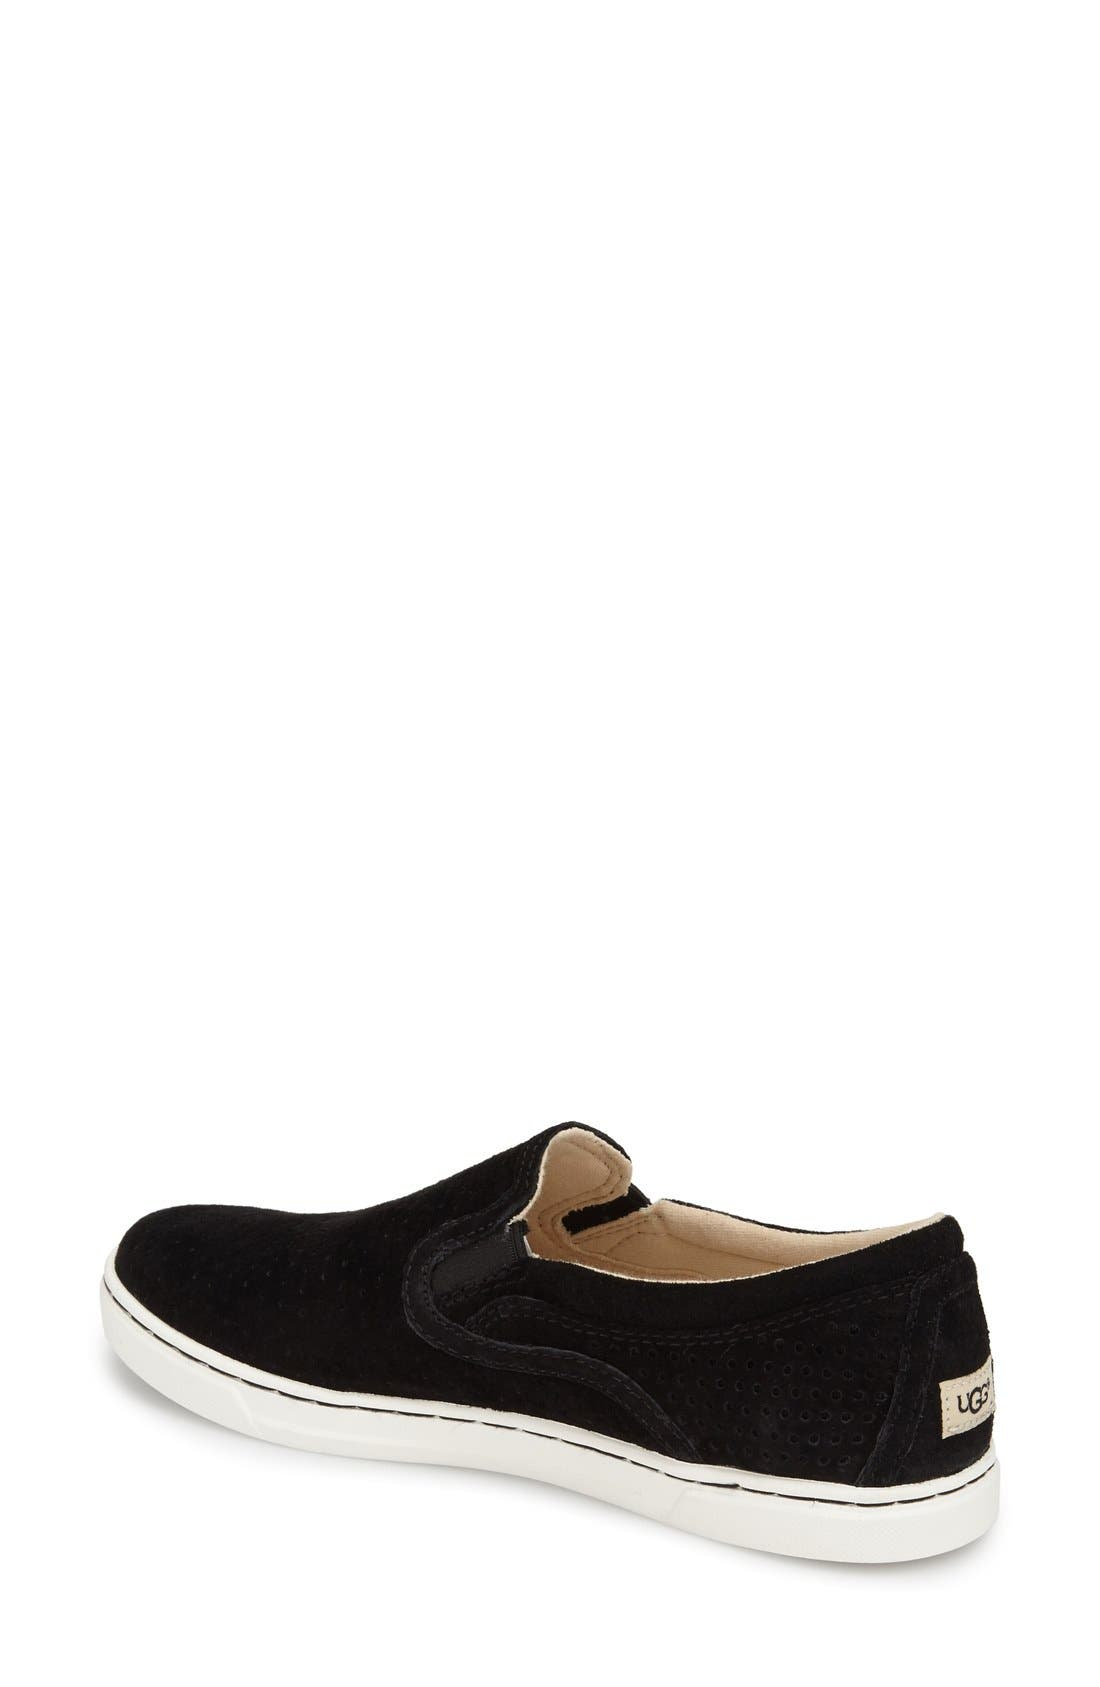 'Fierce Geo' Perforated Slip-On Sneaker,                             Alternate thumbnail 4, color,